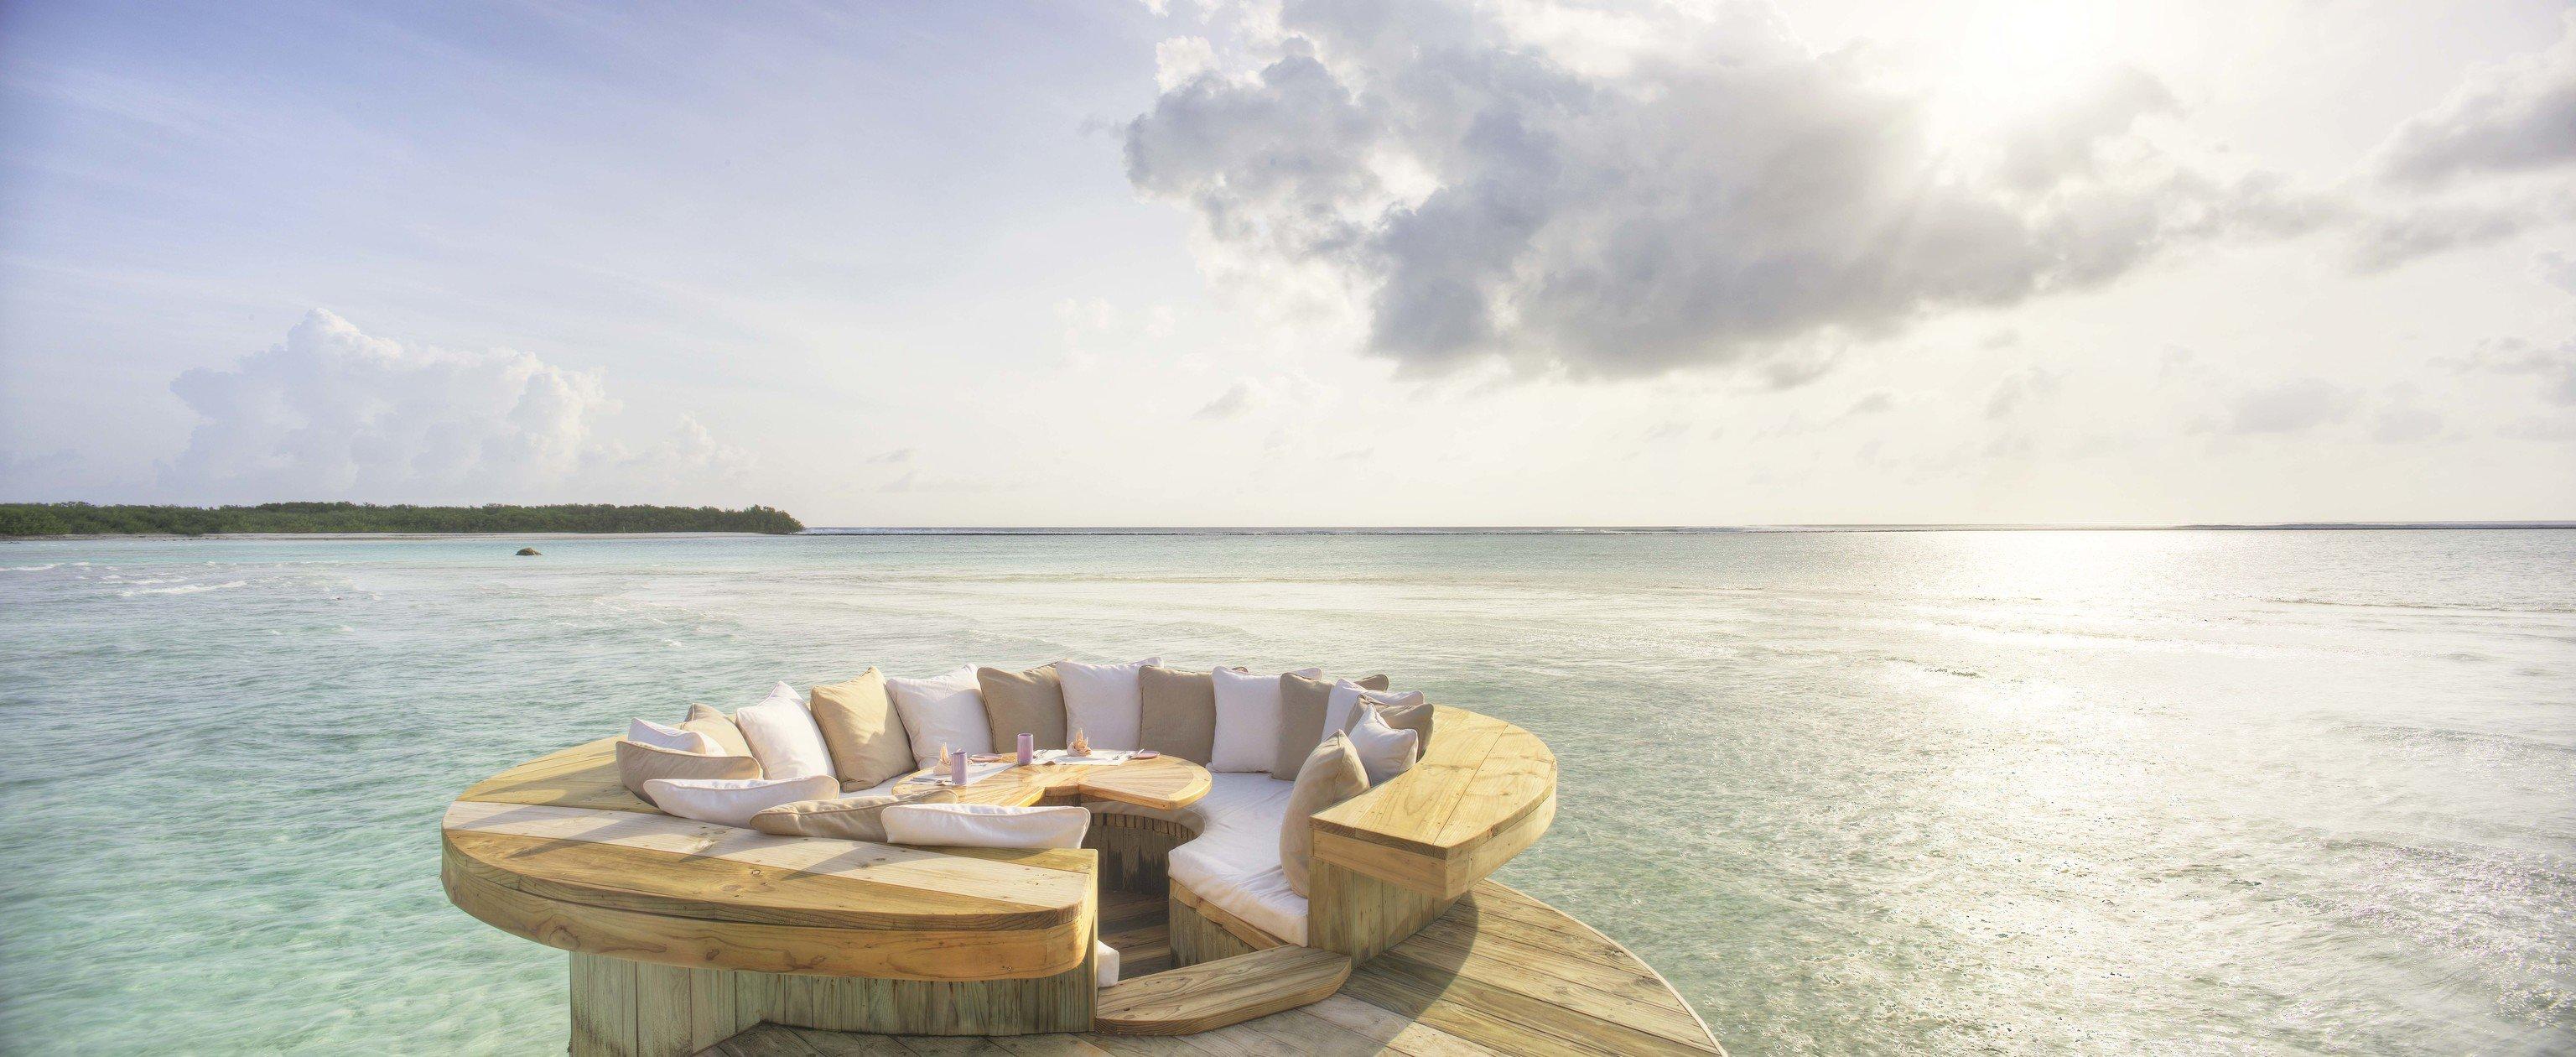 Hotels water sky outdoor shore Sea Ocean vacation Beach Coast bay sand Boat day